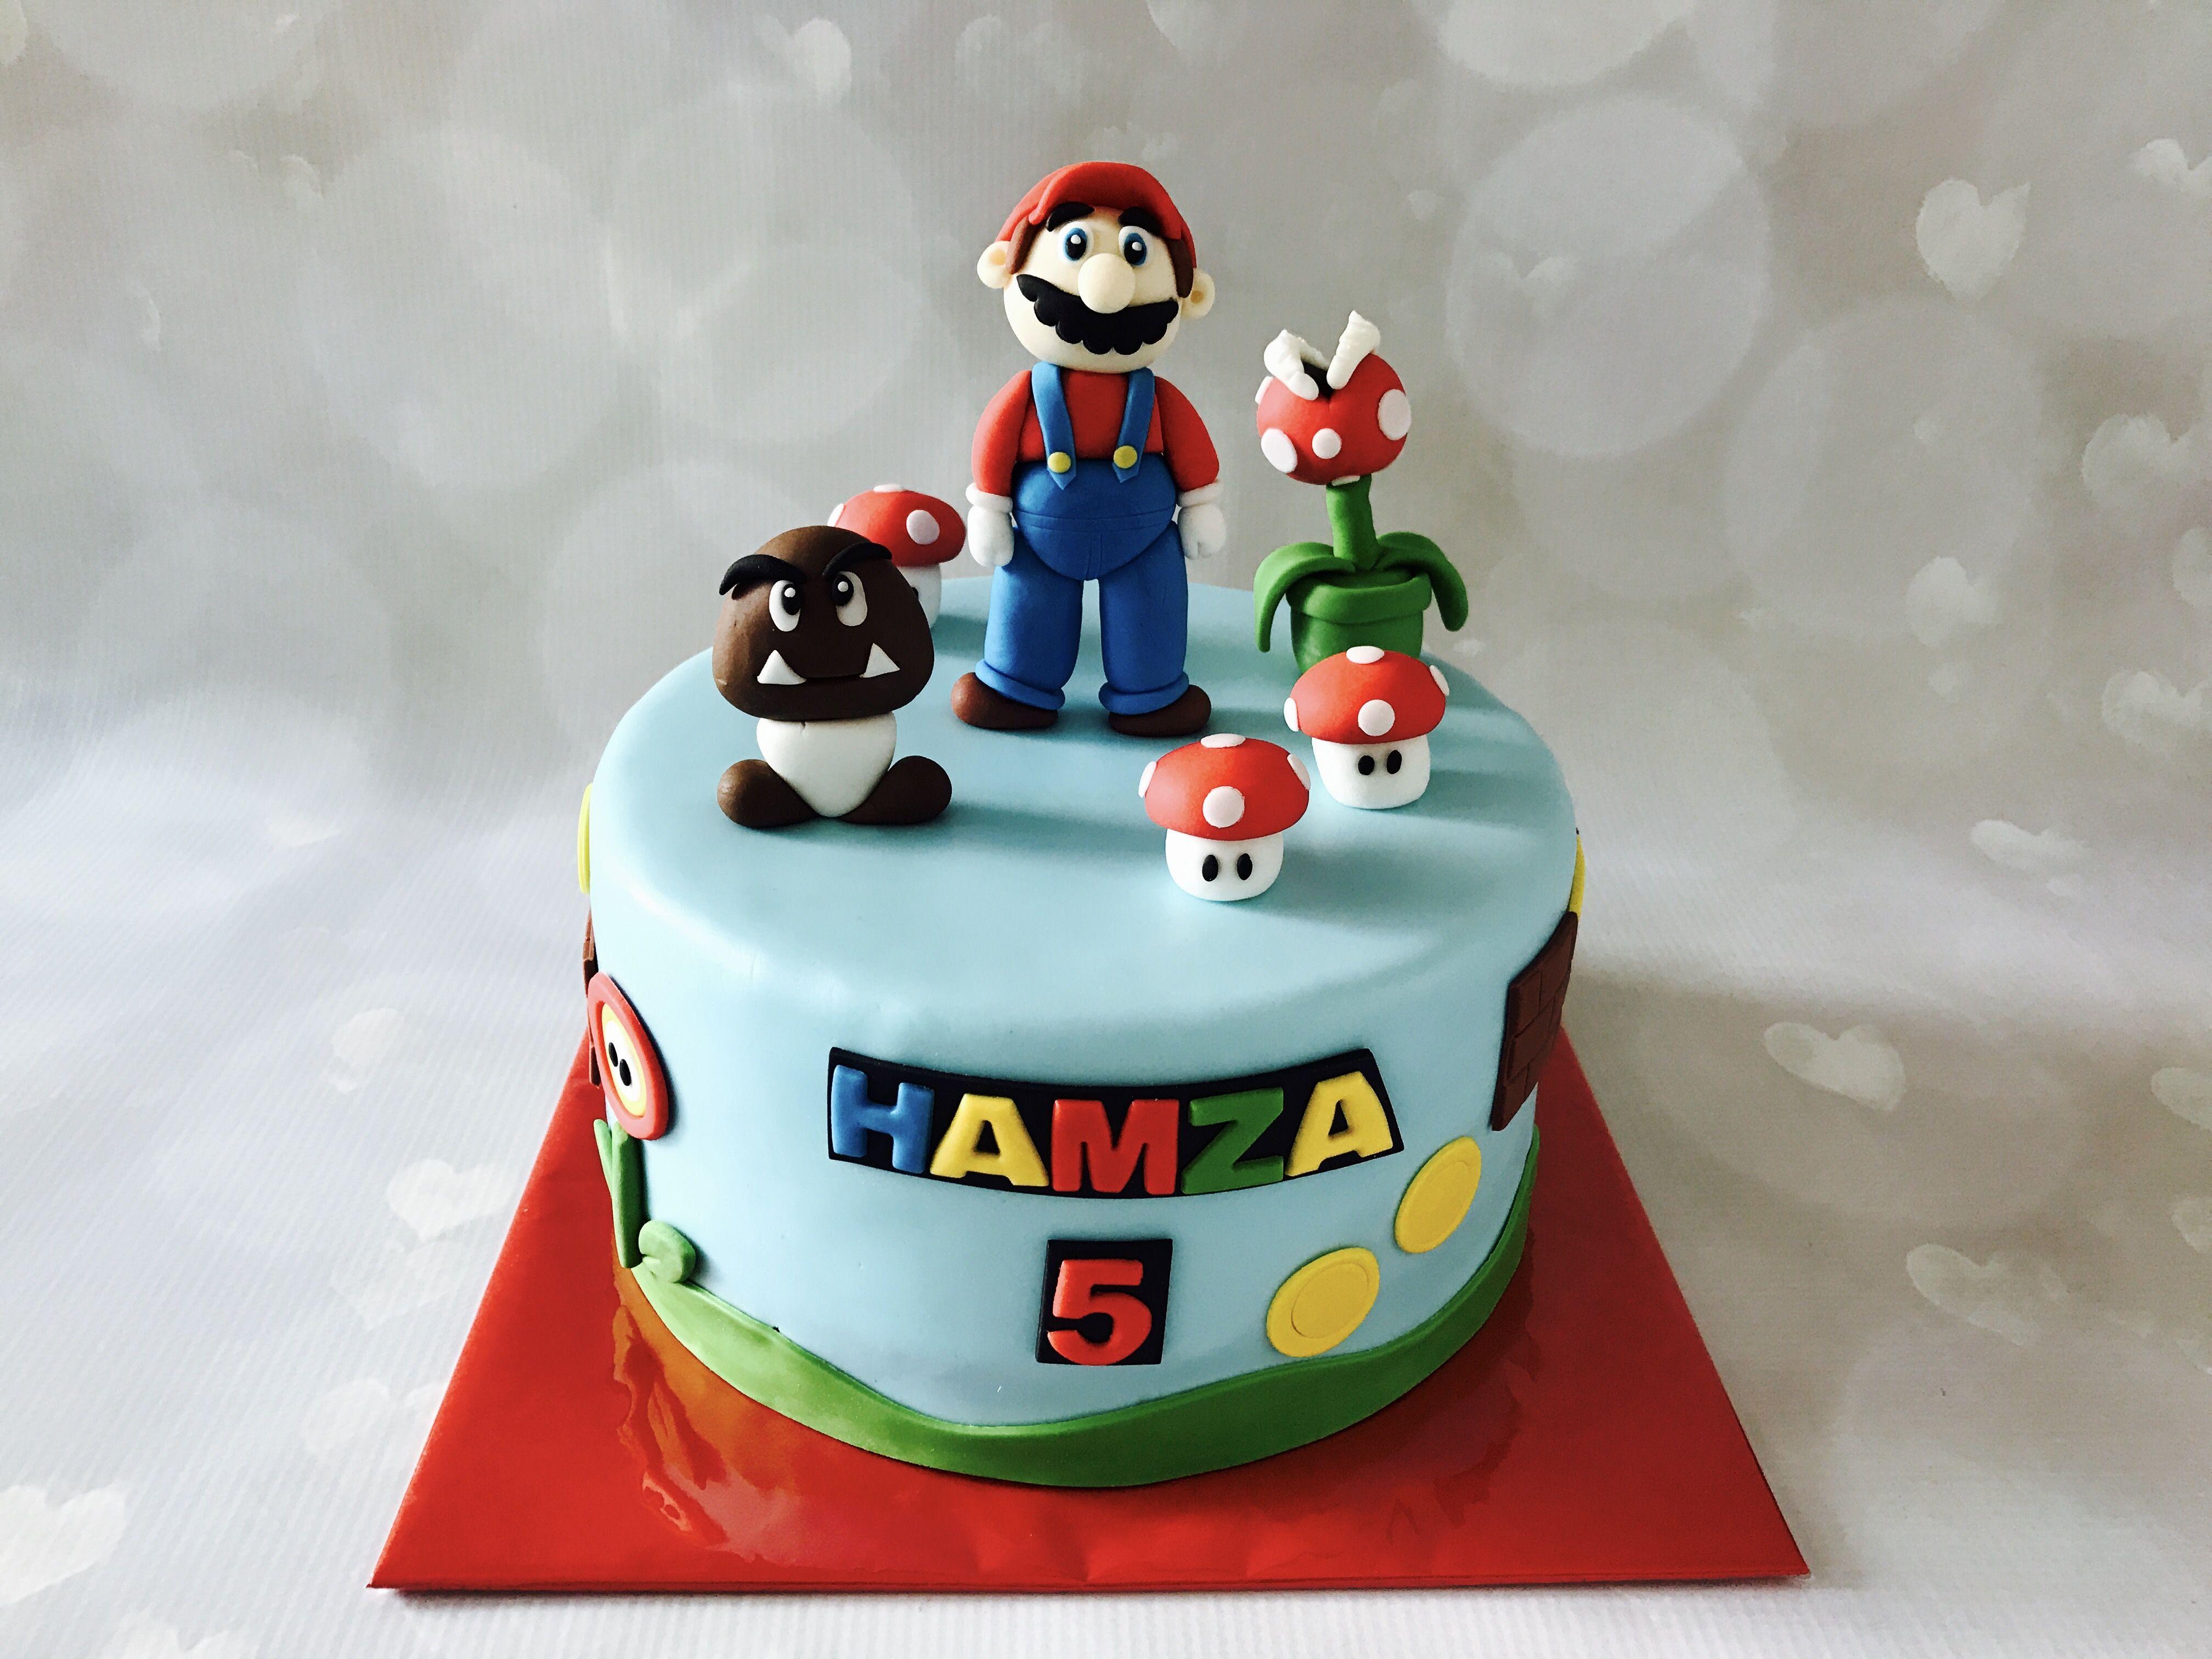 Mario loved making this cake wwwkoningkikkernl